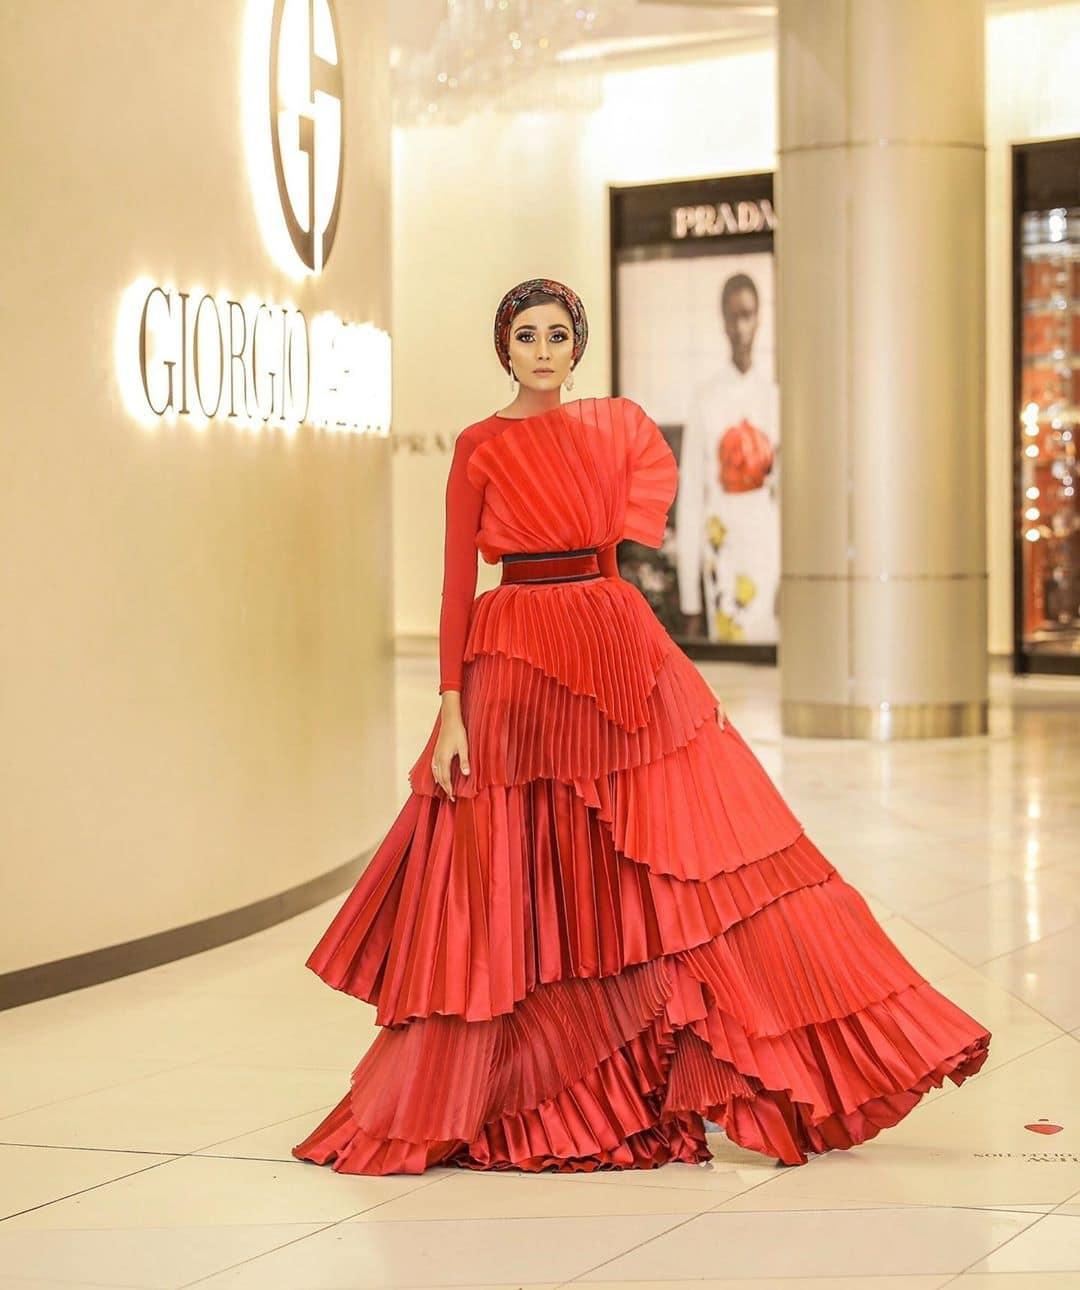 Thameenah-saint-modest-muslimah-chic-red-dress